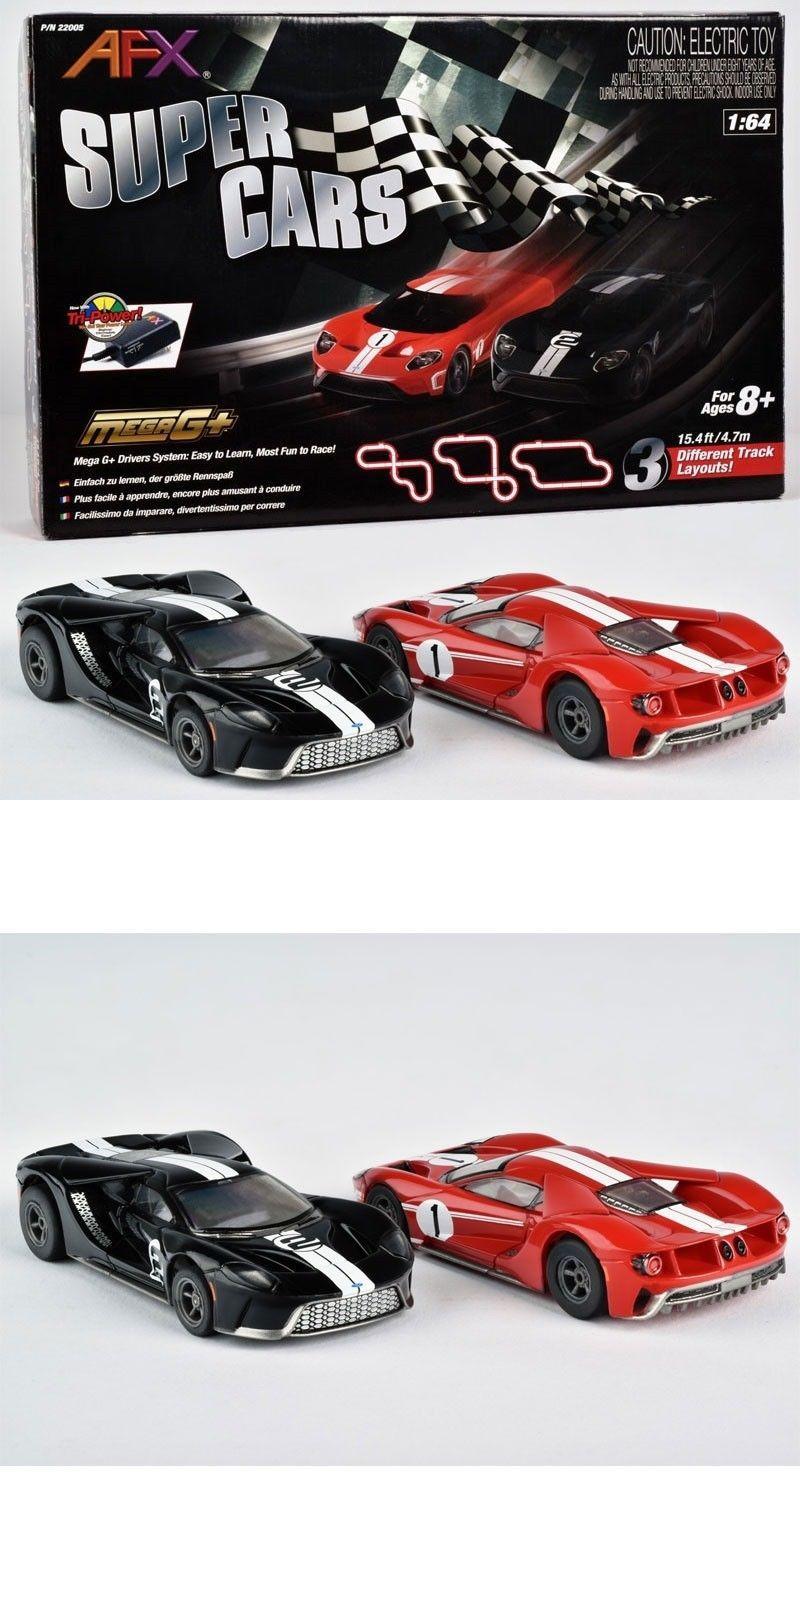 New Afx 22005 Super Cars Ford Gt Mega G Tri Power Ho Slot Car Track Set Free Sh Car Ford Ho Slot Cars Ford Gt